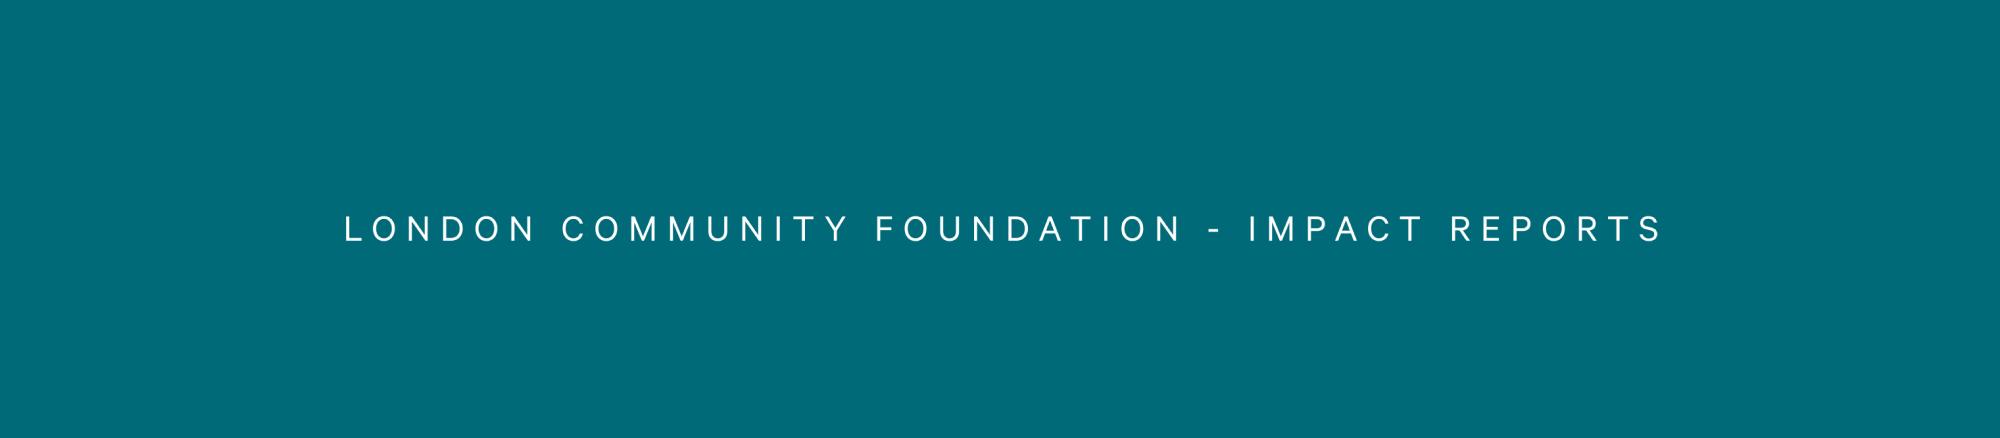 London Community Foundation - Impact Reports Banner